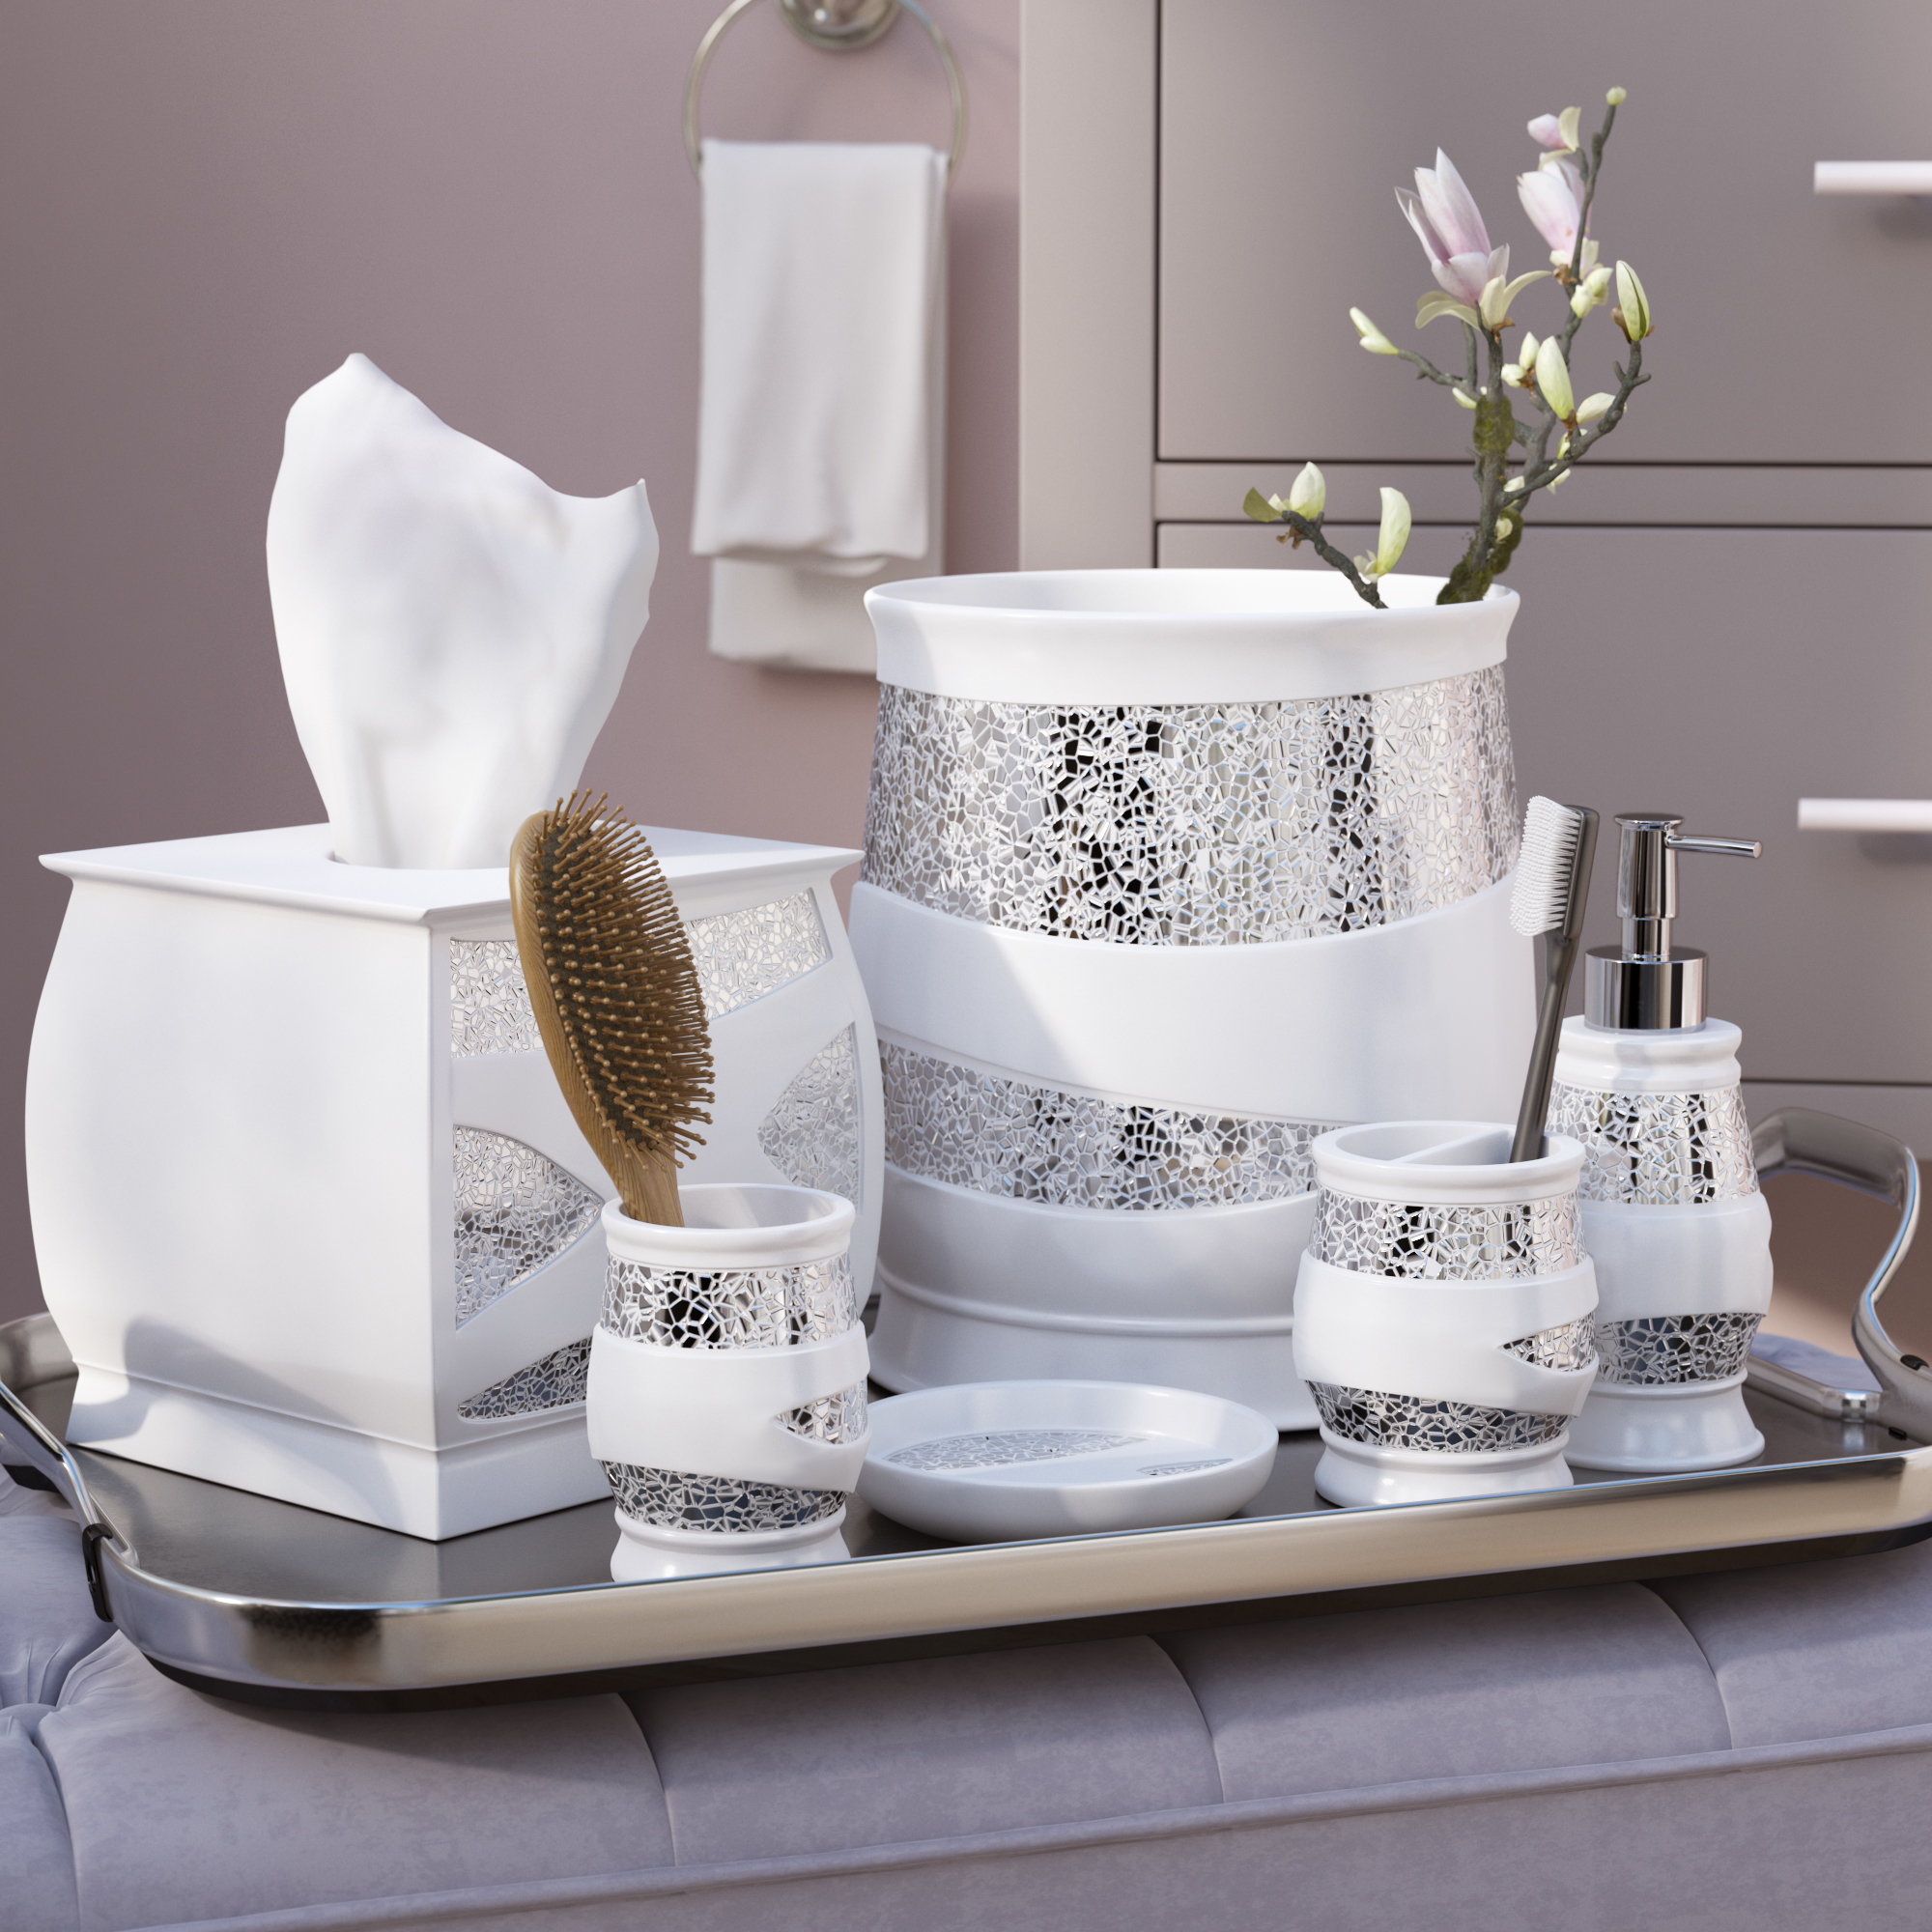 badsets willa arlo interiors rivet 6 pieces white / silver bathroom accessories set & GRUFCMU